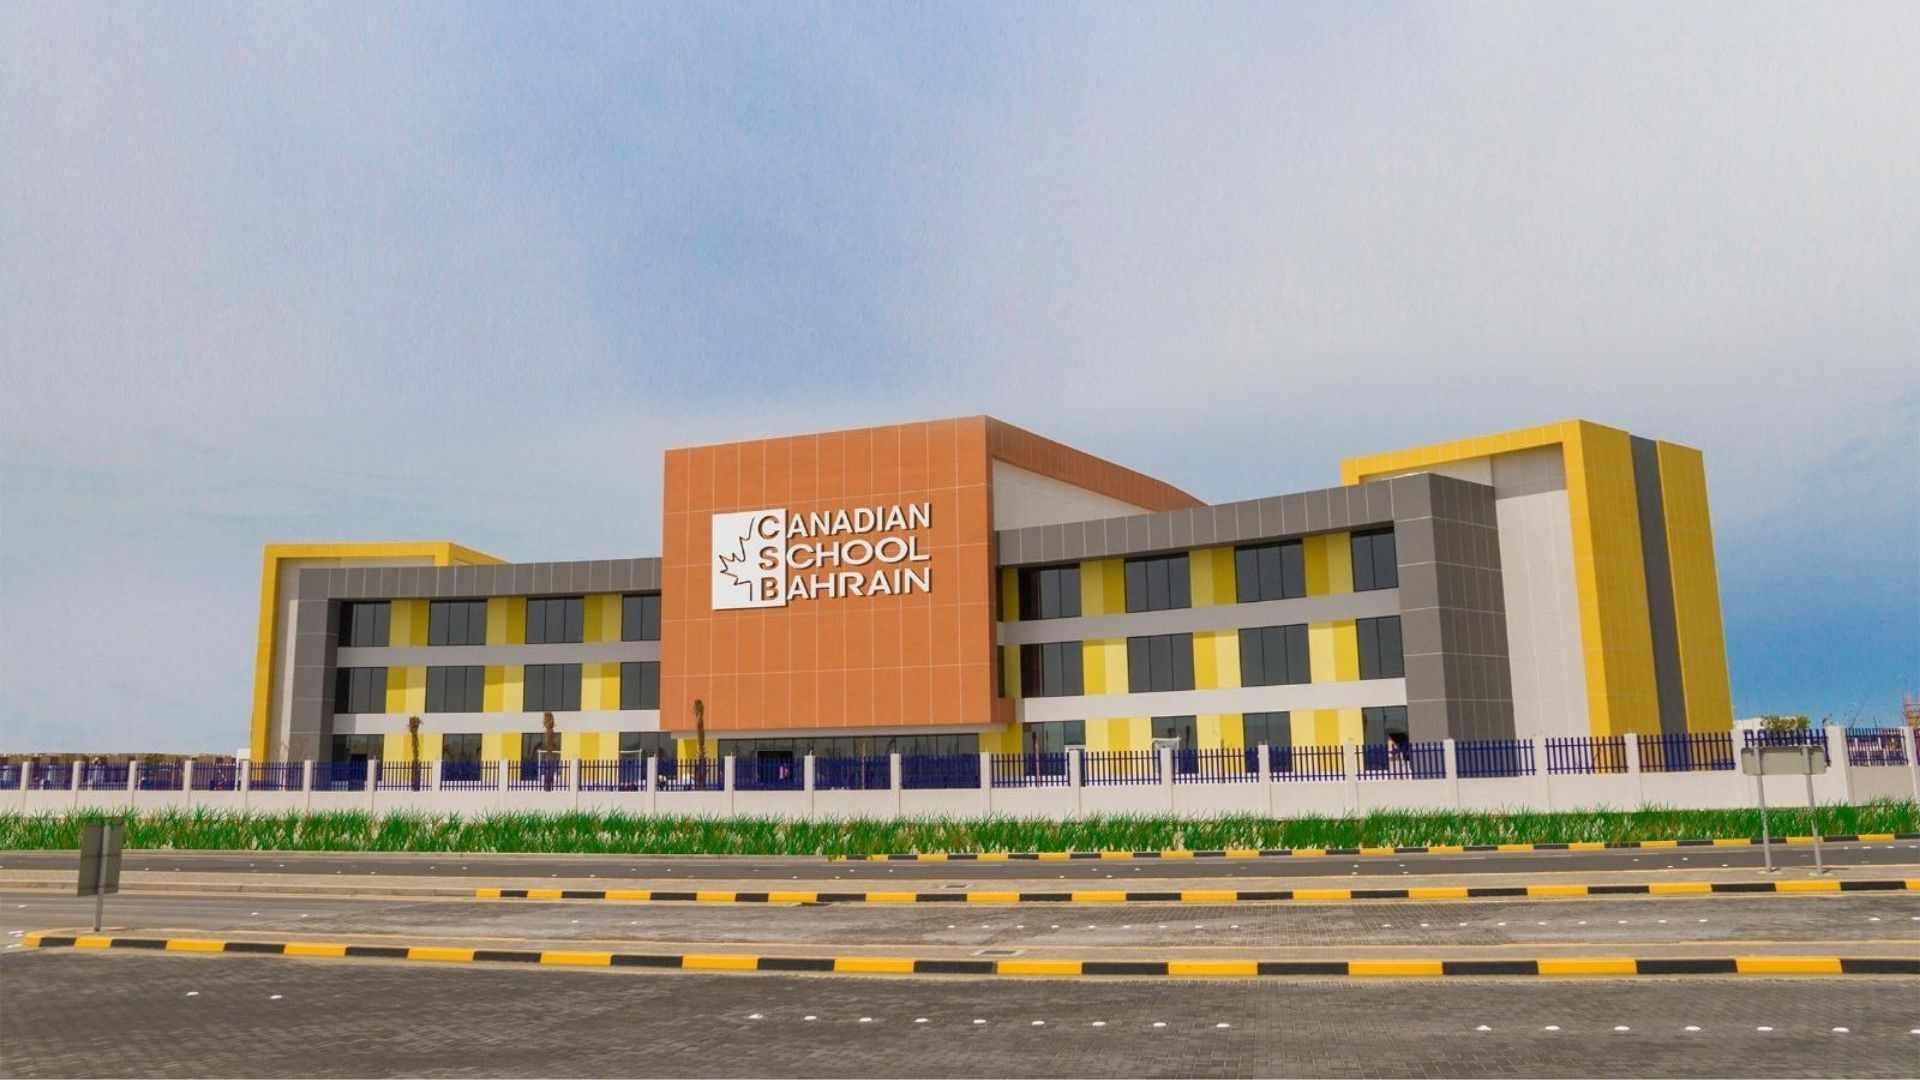 school bahrain canadian